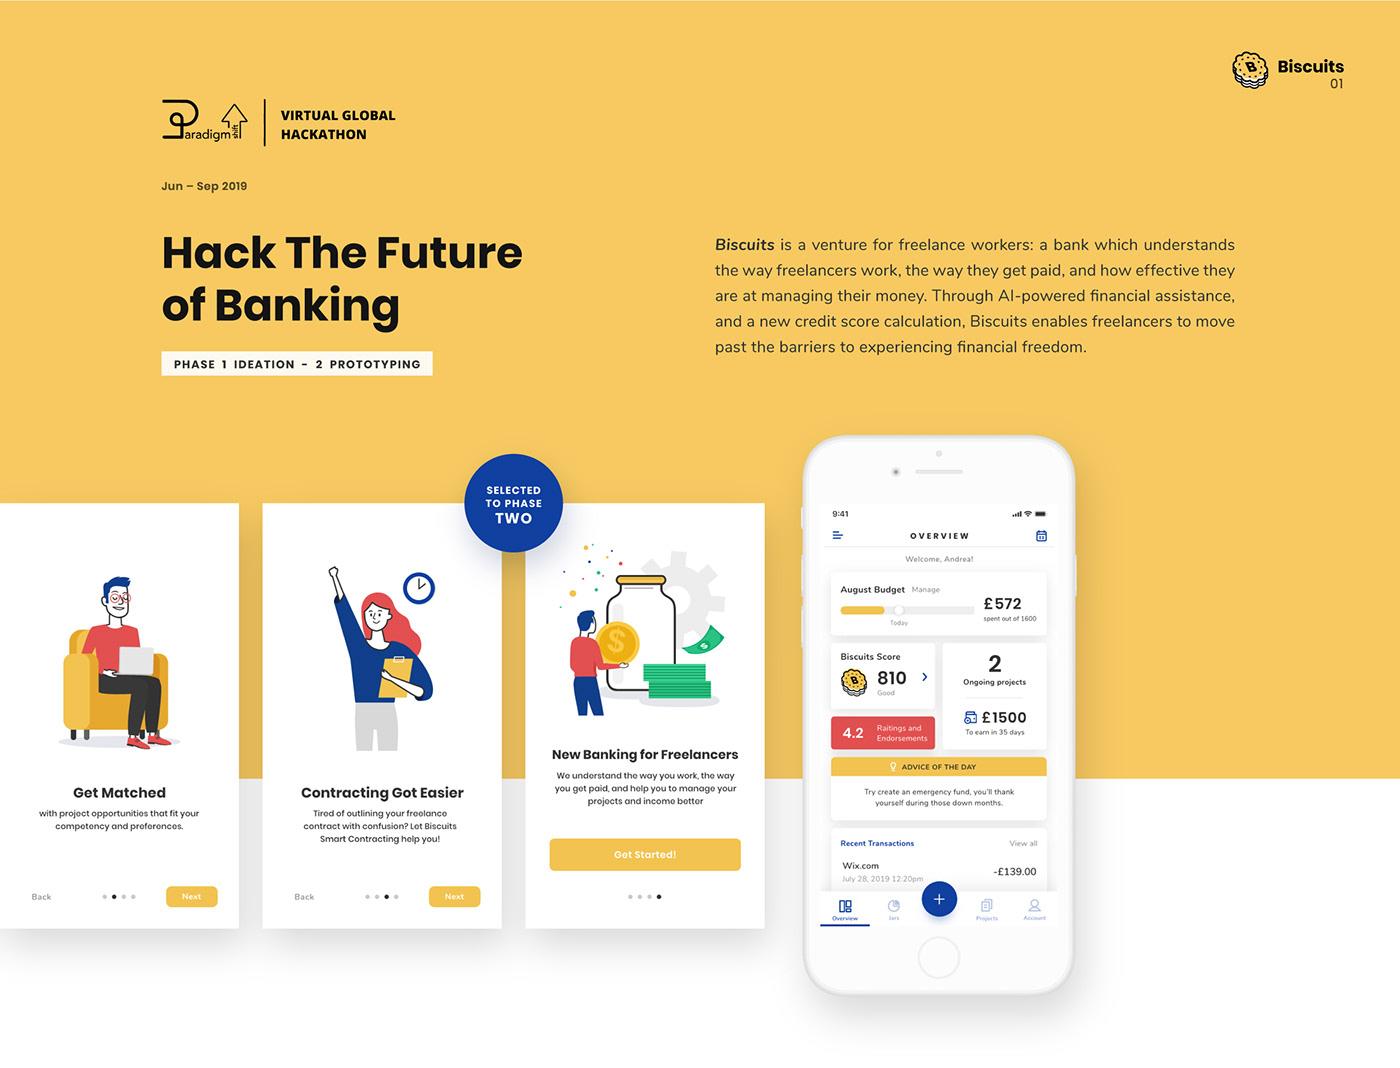 DBS paradigm shift hackathon future banking banking app freelancer Freelance money app banking financial management freelance app